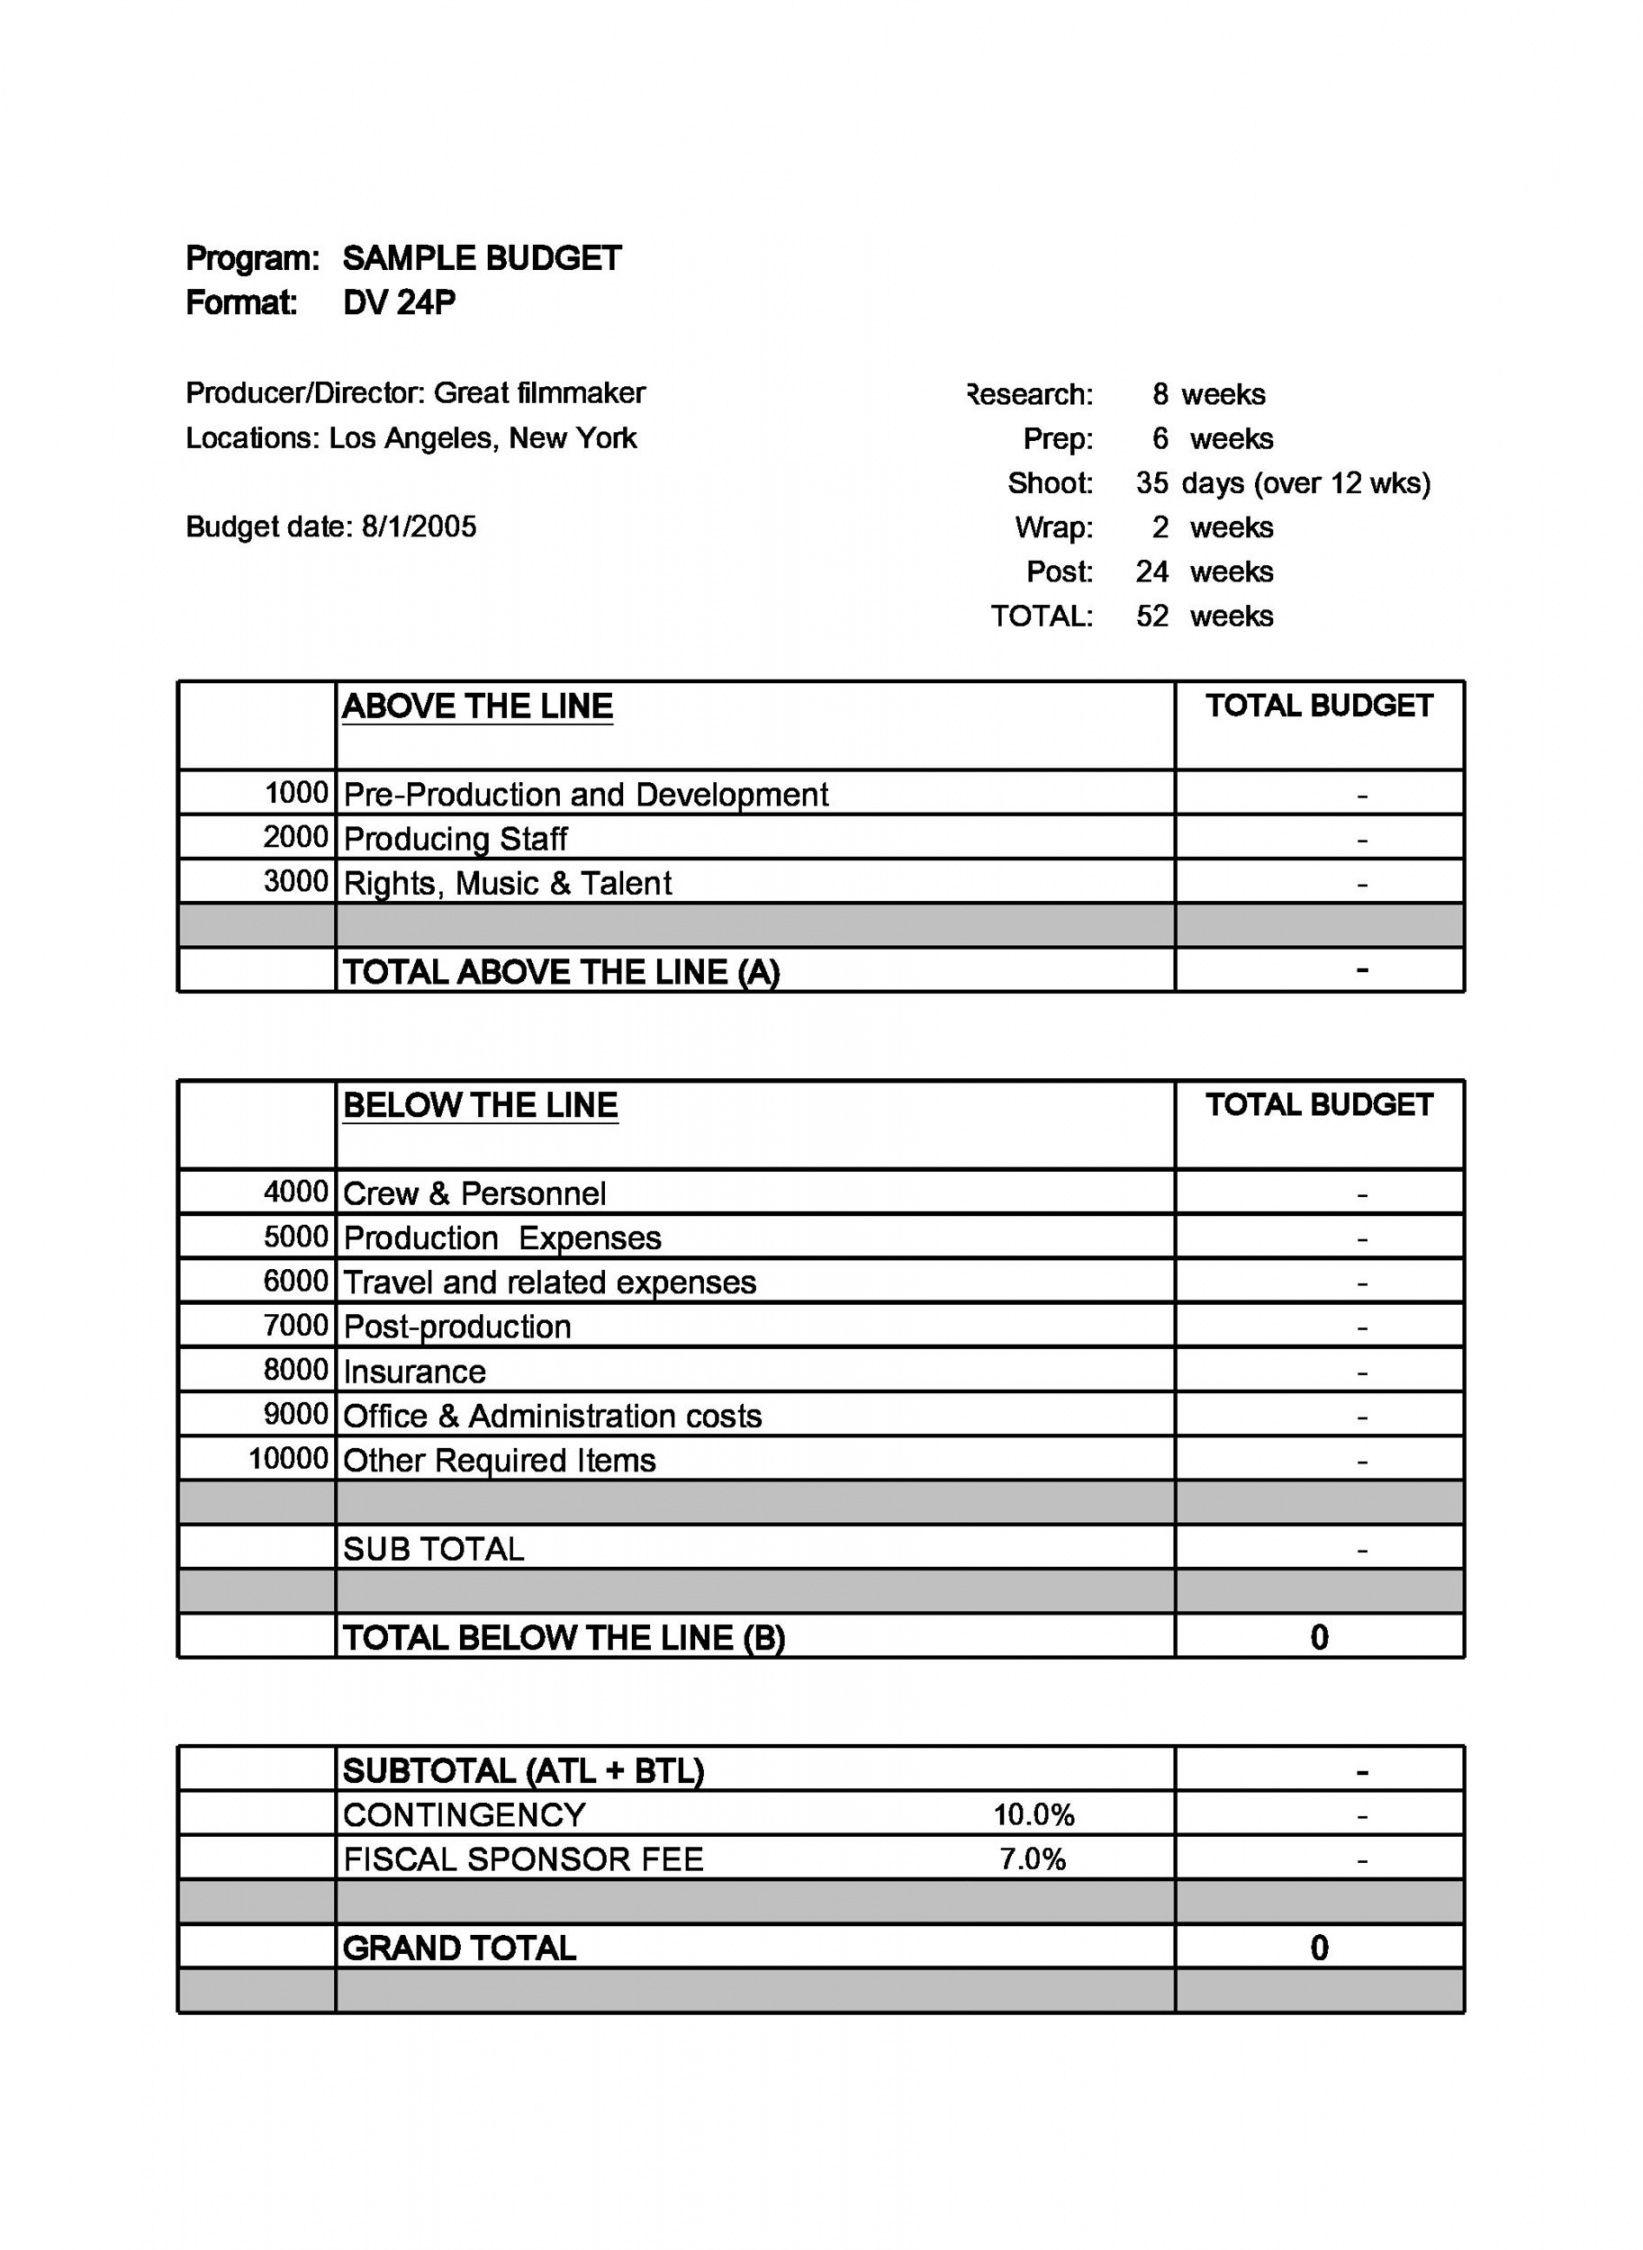 editable 33 free film budget templates excel word ᐅ templatelab post production budget template doc